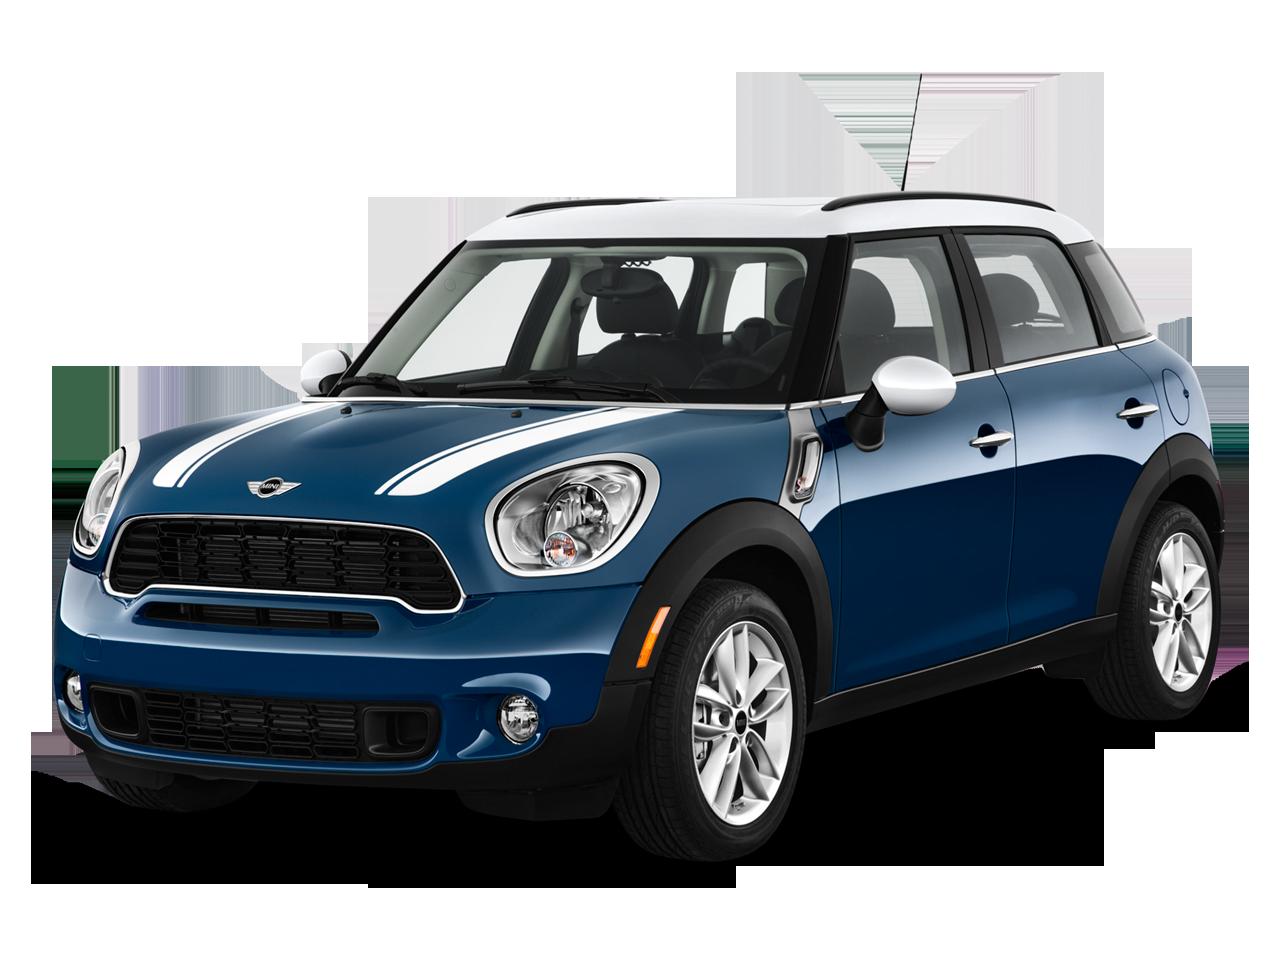 Mini Car Prices 40 Cool Car Hd Wallpaper